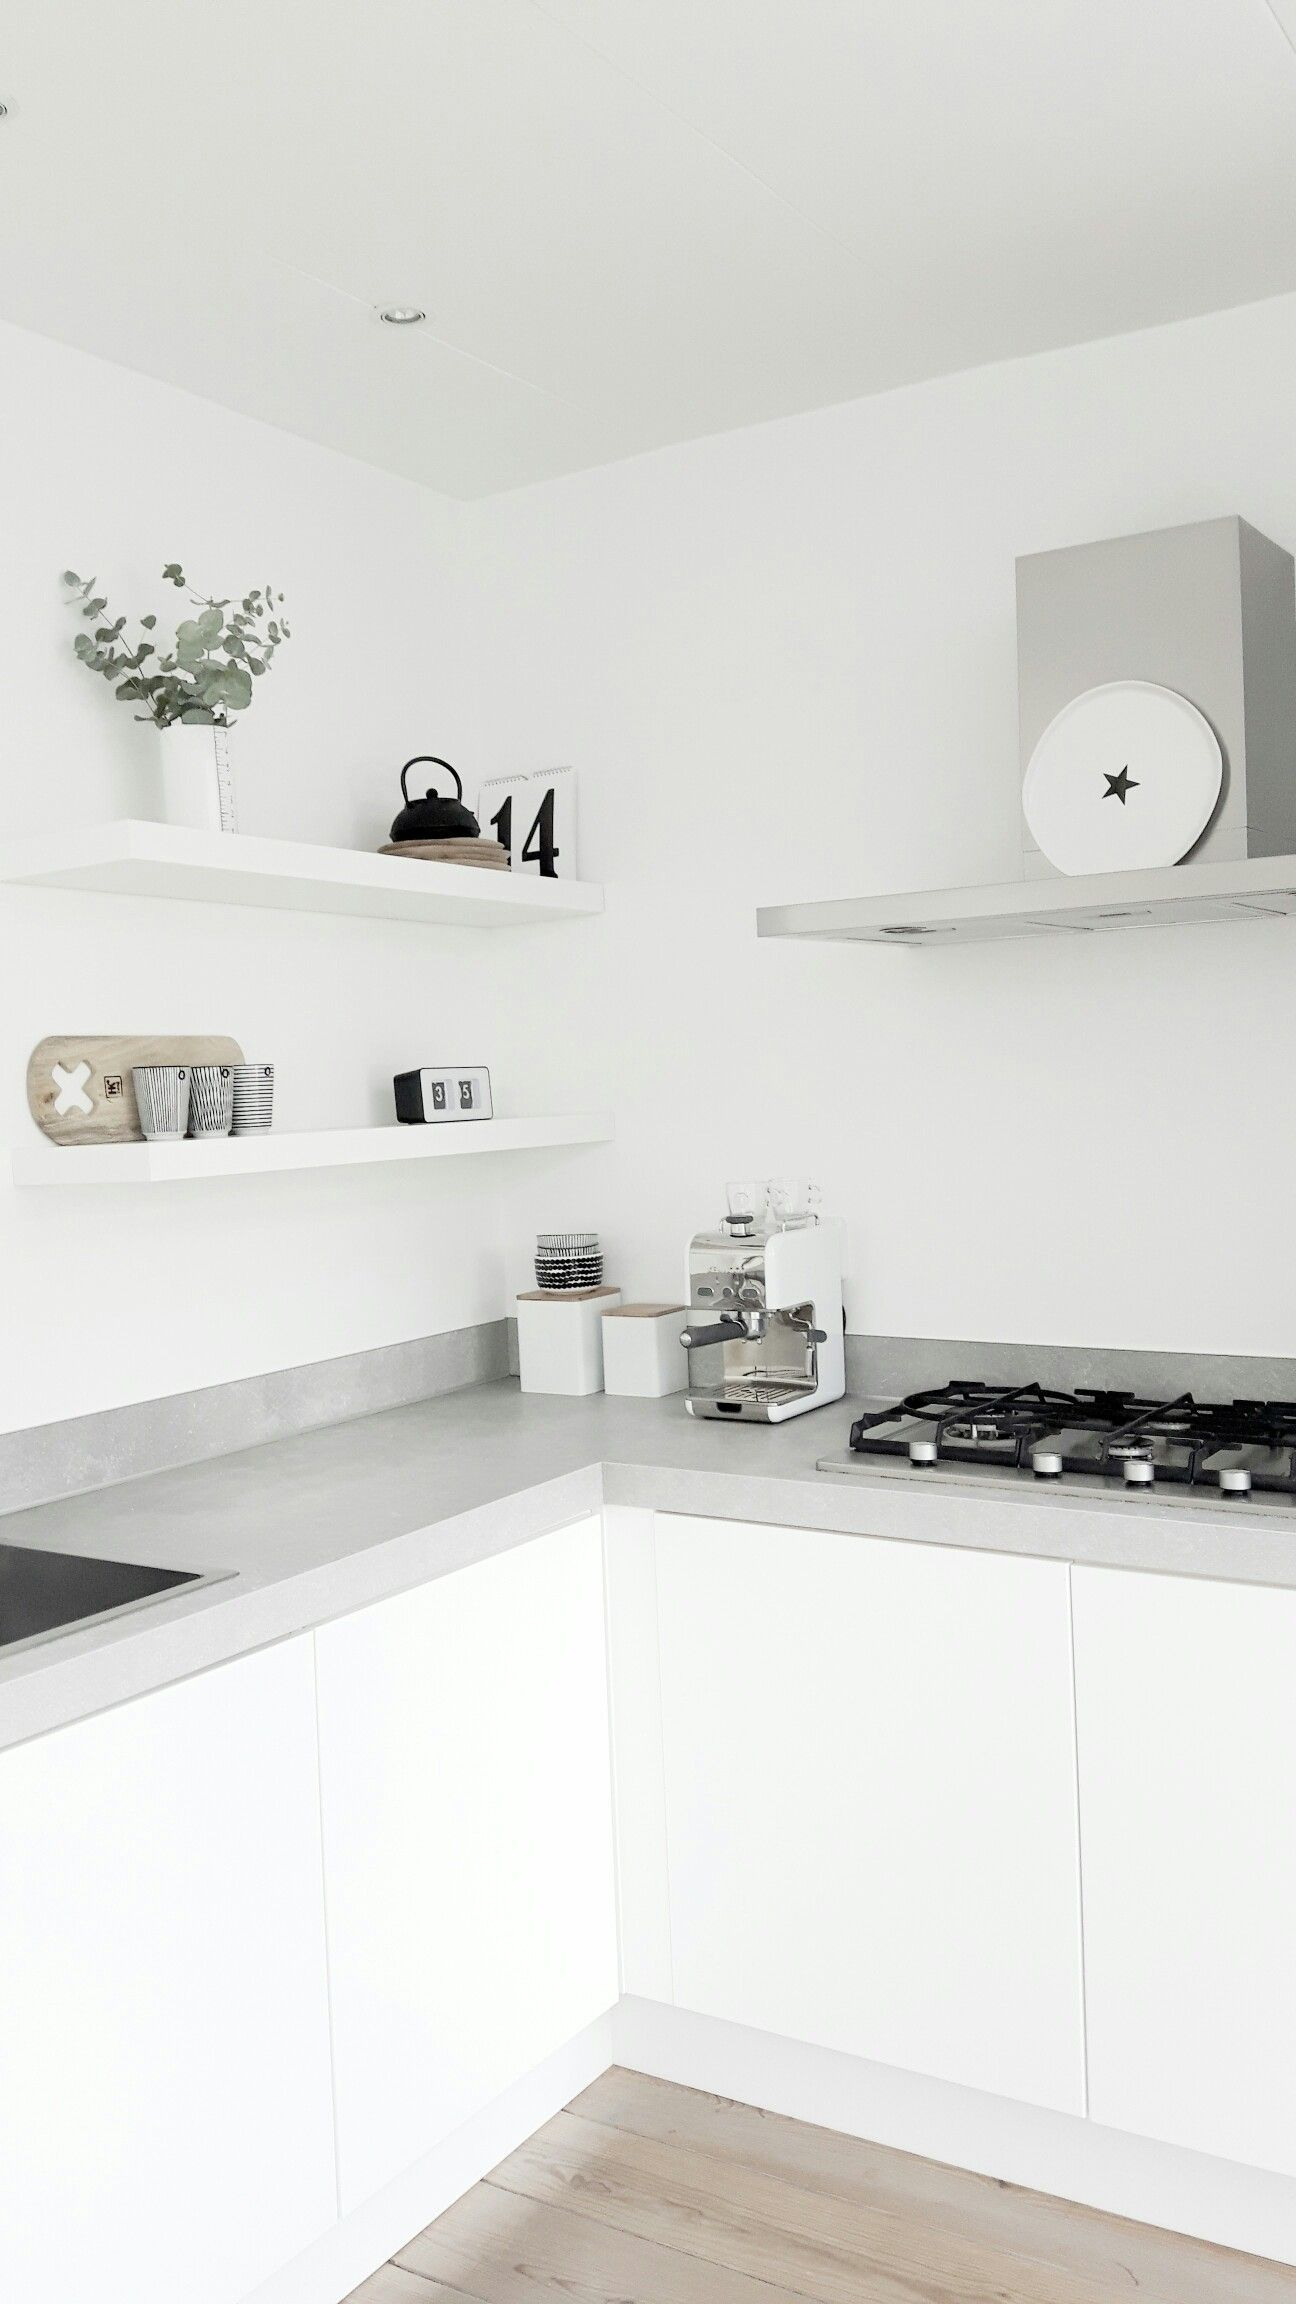 Surprising Ikea Kitchen Style Sweet Style In 2019 Modern Ikea Creativecarmelina Interior Chair Design Creativecarmelinacom